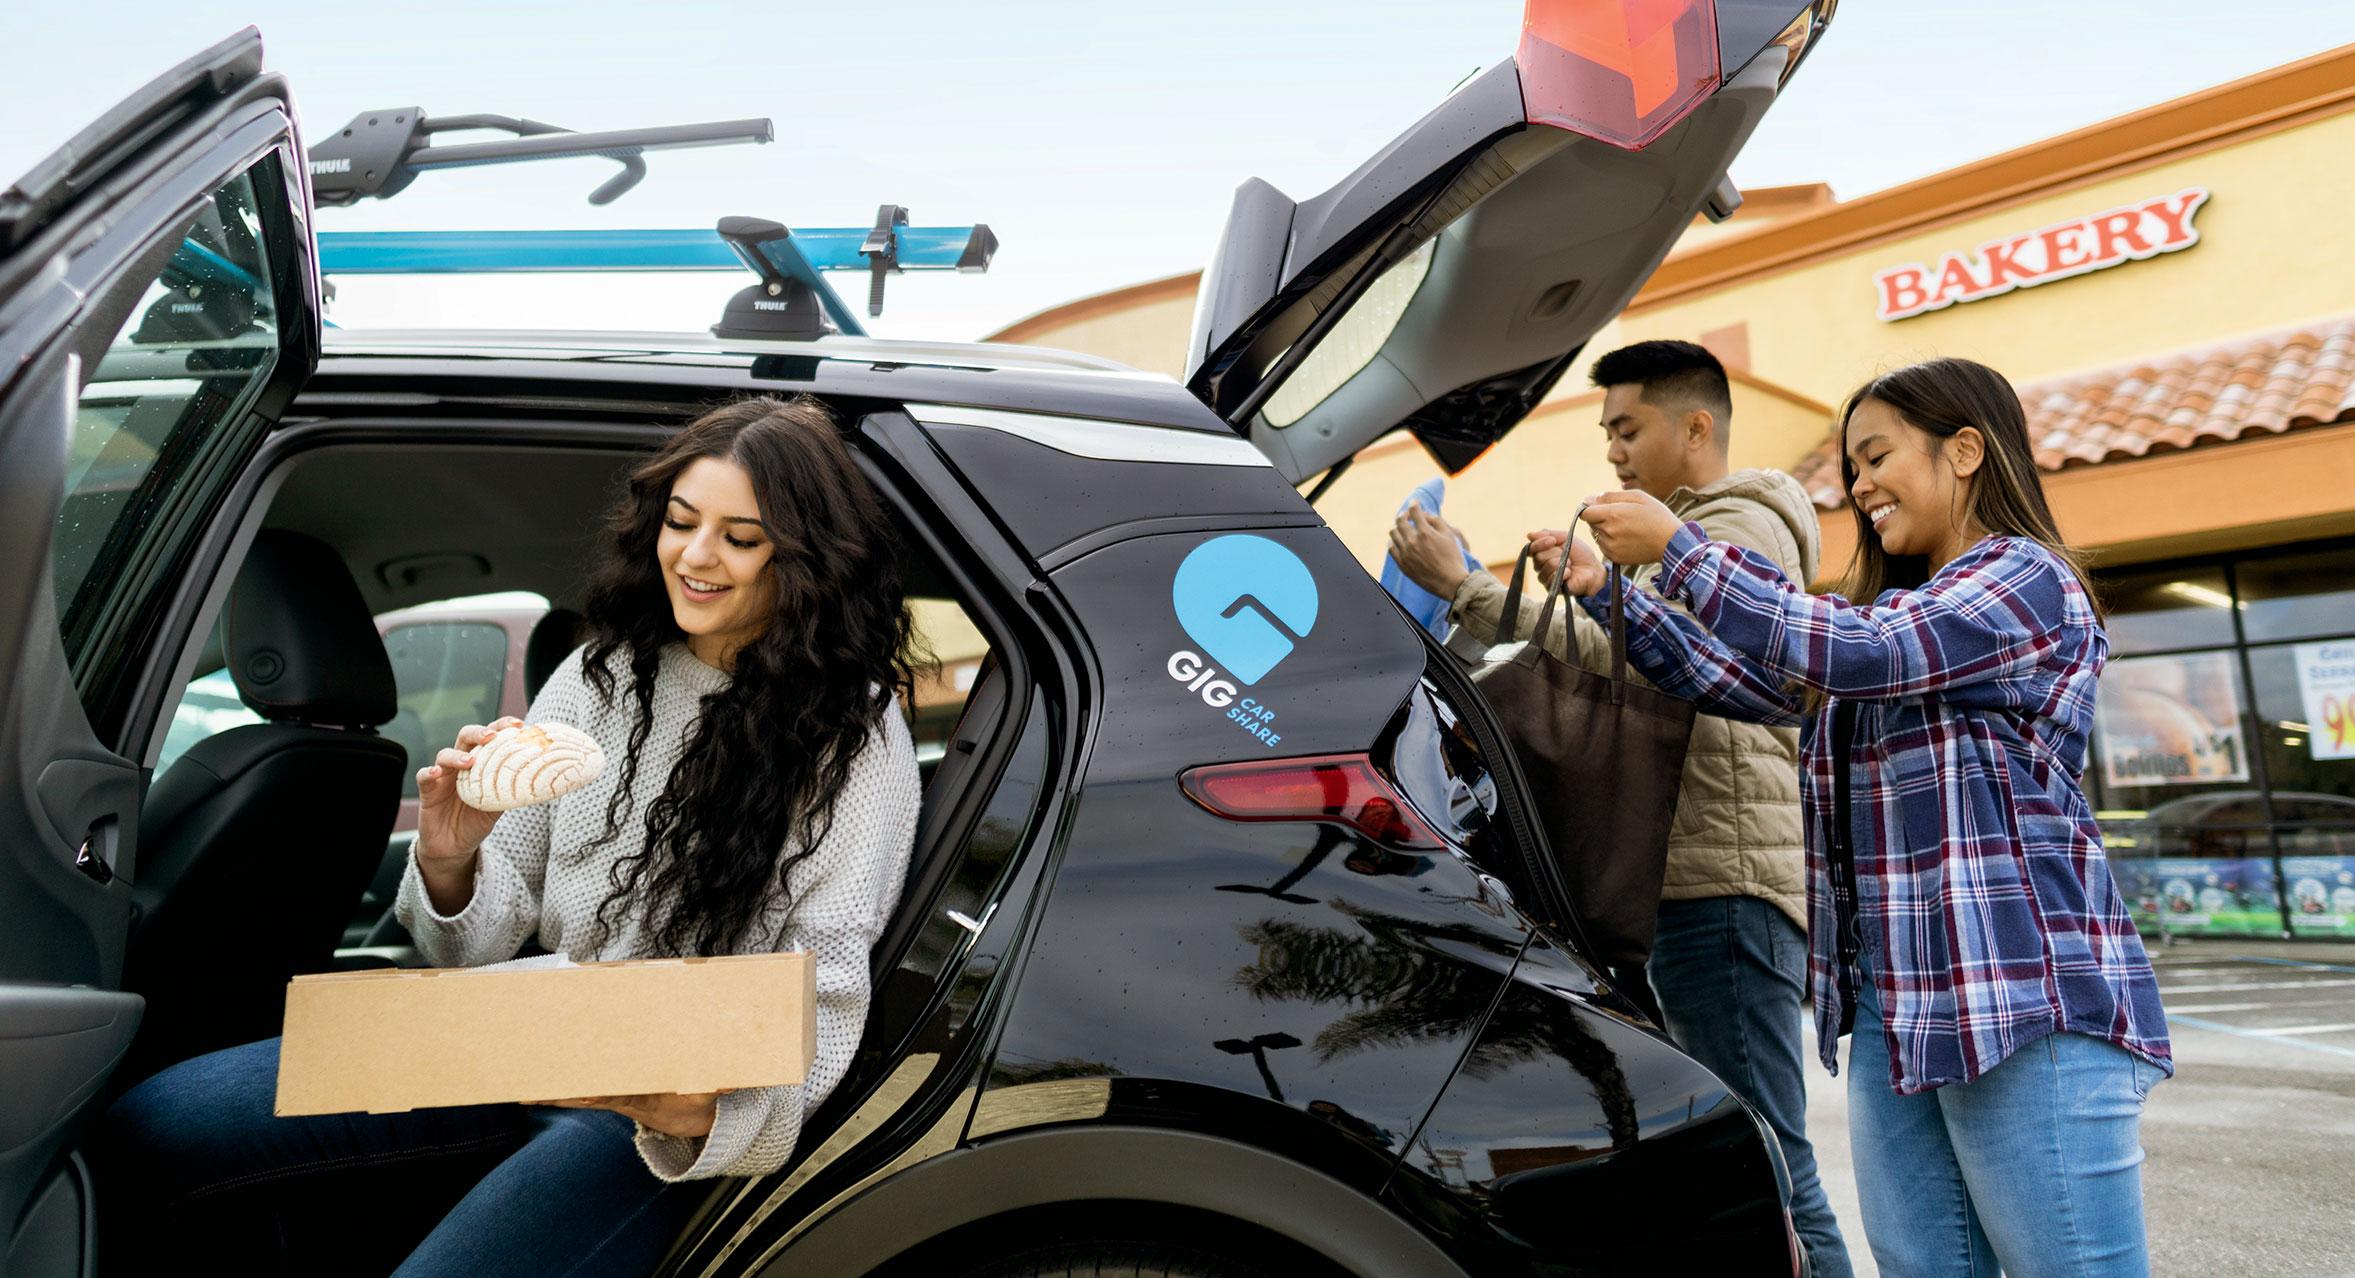 images?q=tbn:ANd9GcQh_l3eQ5xwiPy07kGEXjmjgmBKBRB7H2mRxCGhv1tFWg5c_mWT Best Of Aaa Auto Insurance Sacramento Ca @autoinsuranceluck.xyz